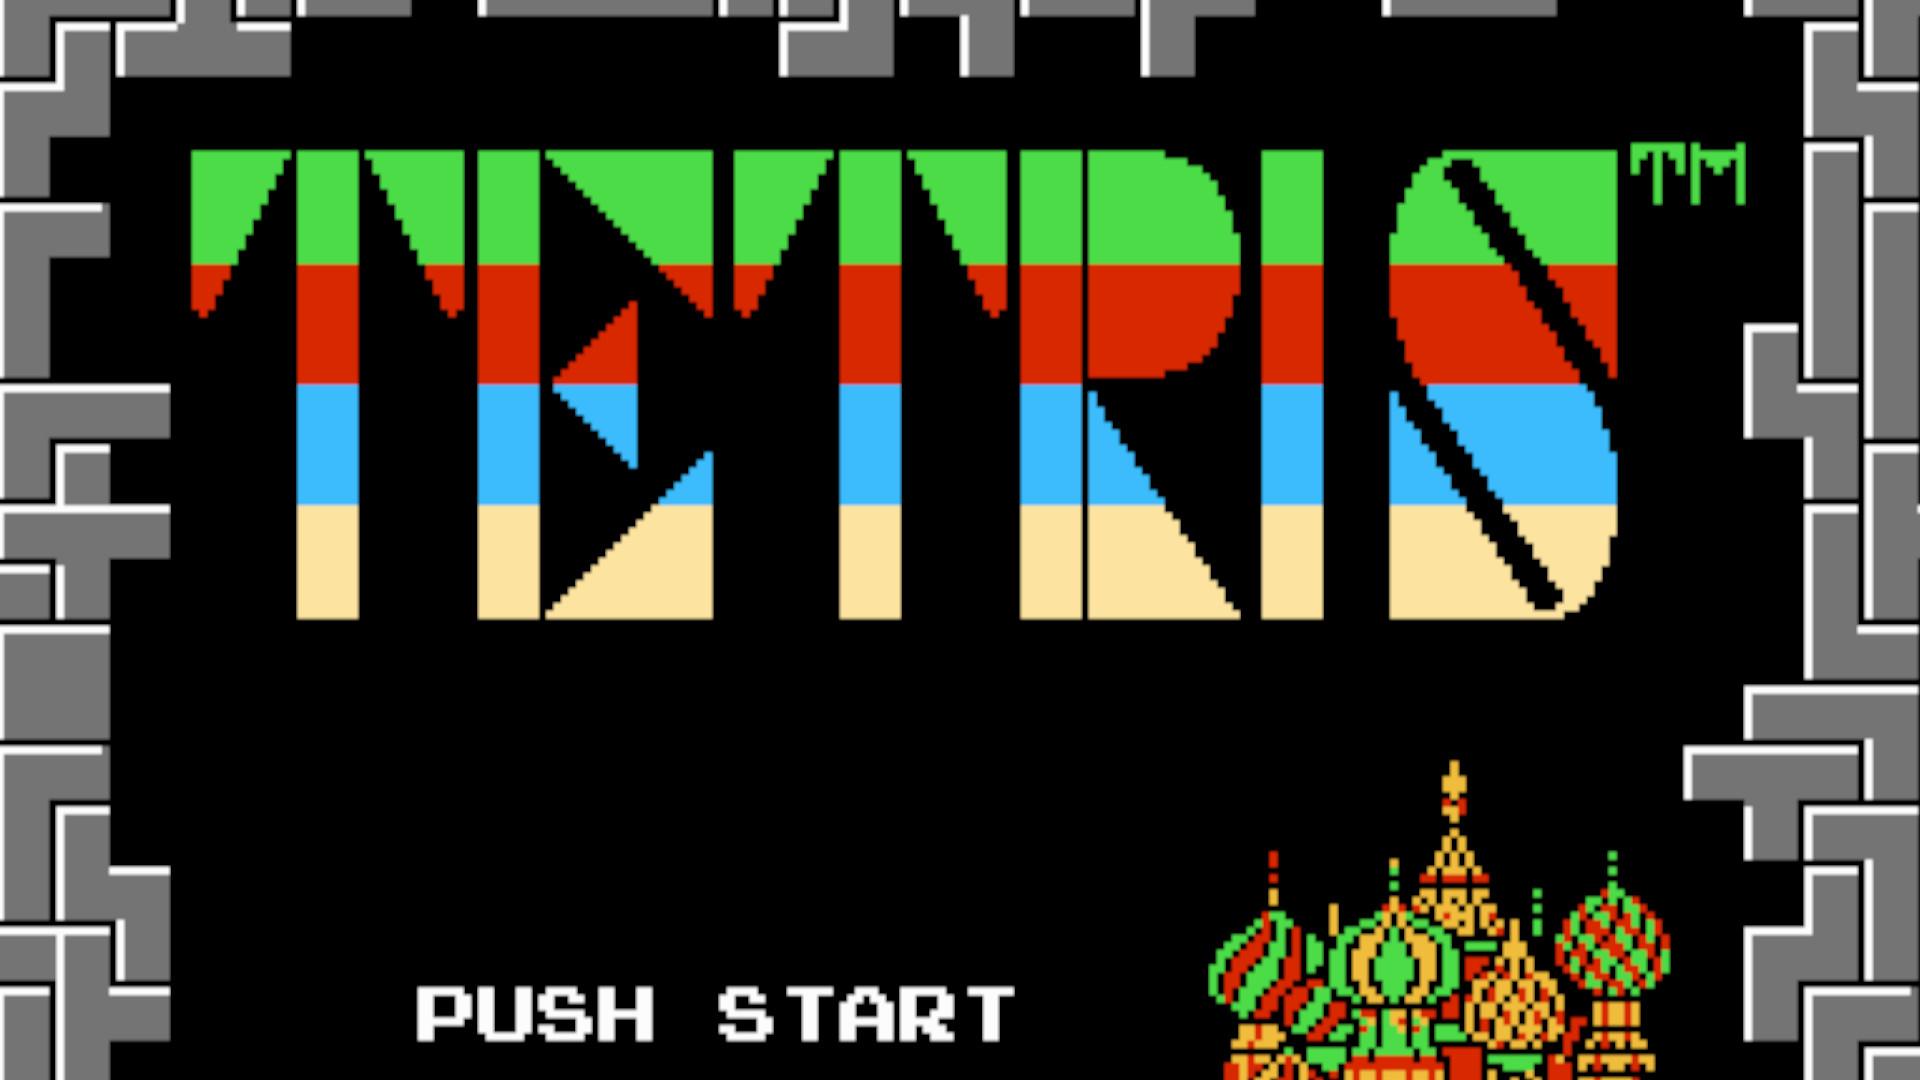 Romhacker adds the best part of modern Tetris to the best version of retro Tetris